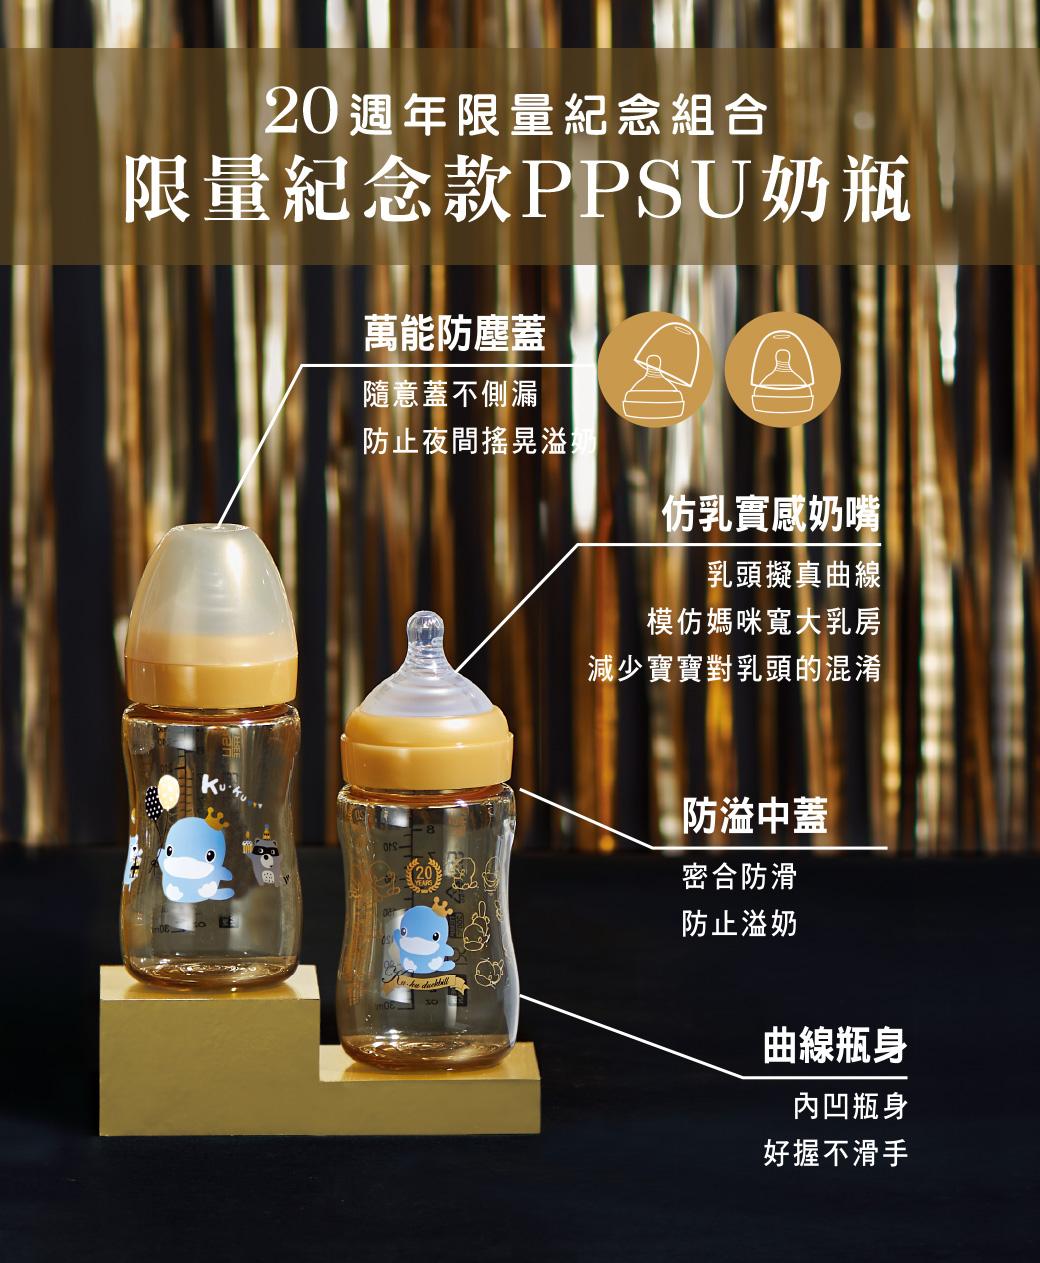 proimages/bottles/PPSU/5879/5879--20週年PPSU奶瓶組-EDM-2.jpg